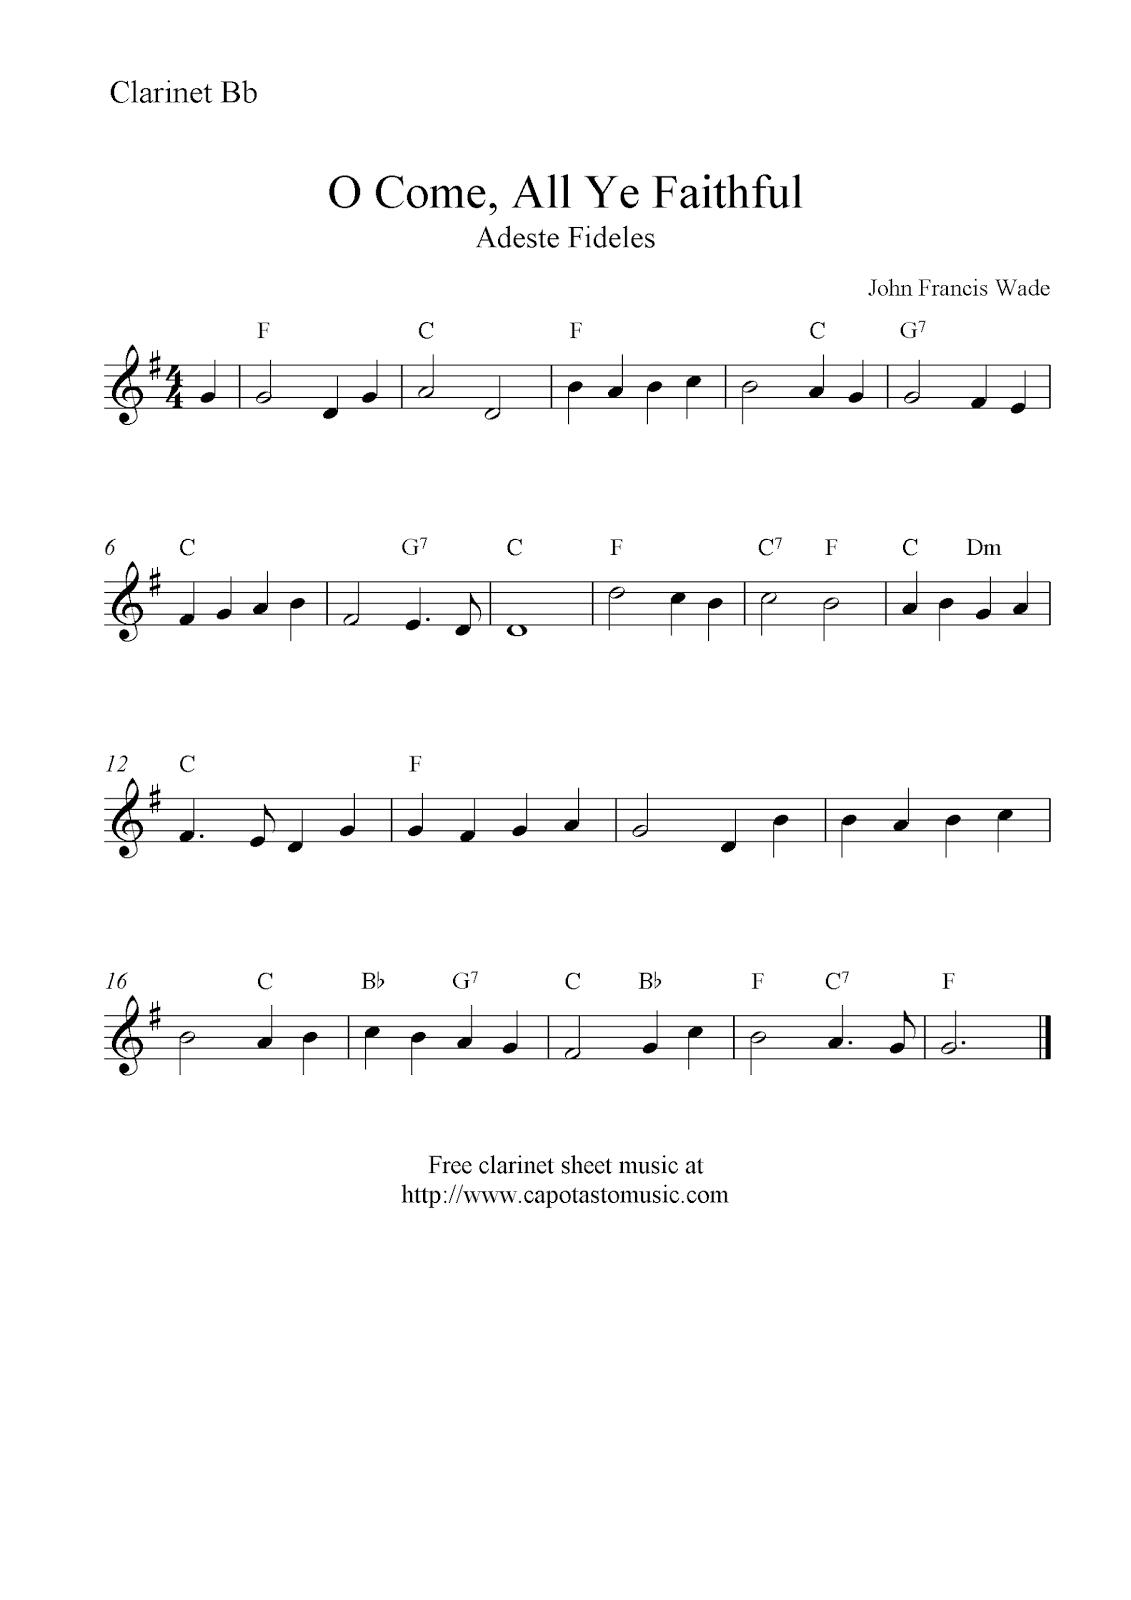 O Come All Ye Faithful Free Christmas Clarinet Sheet Music Notes